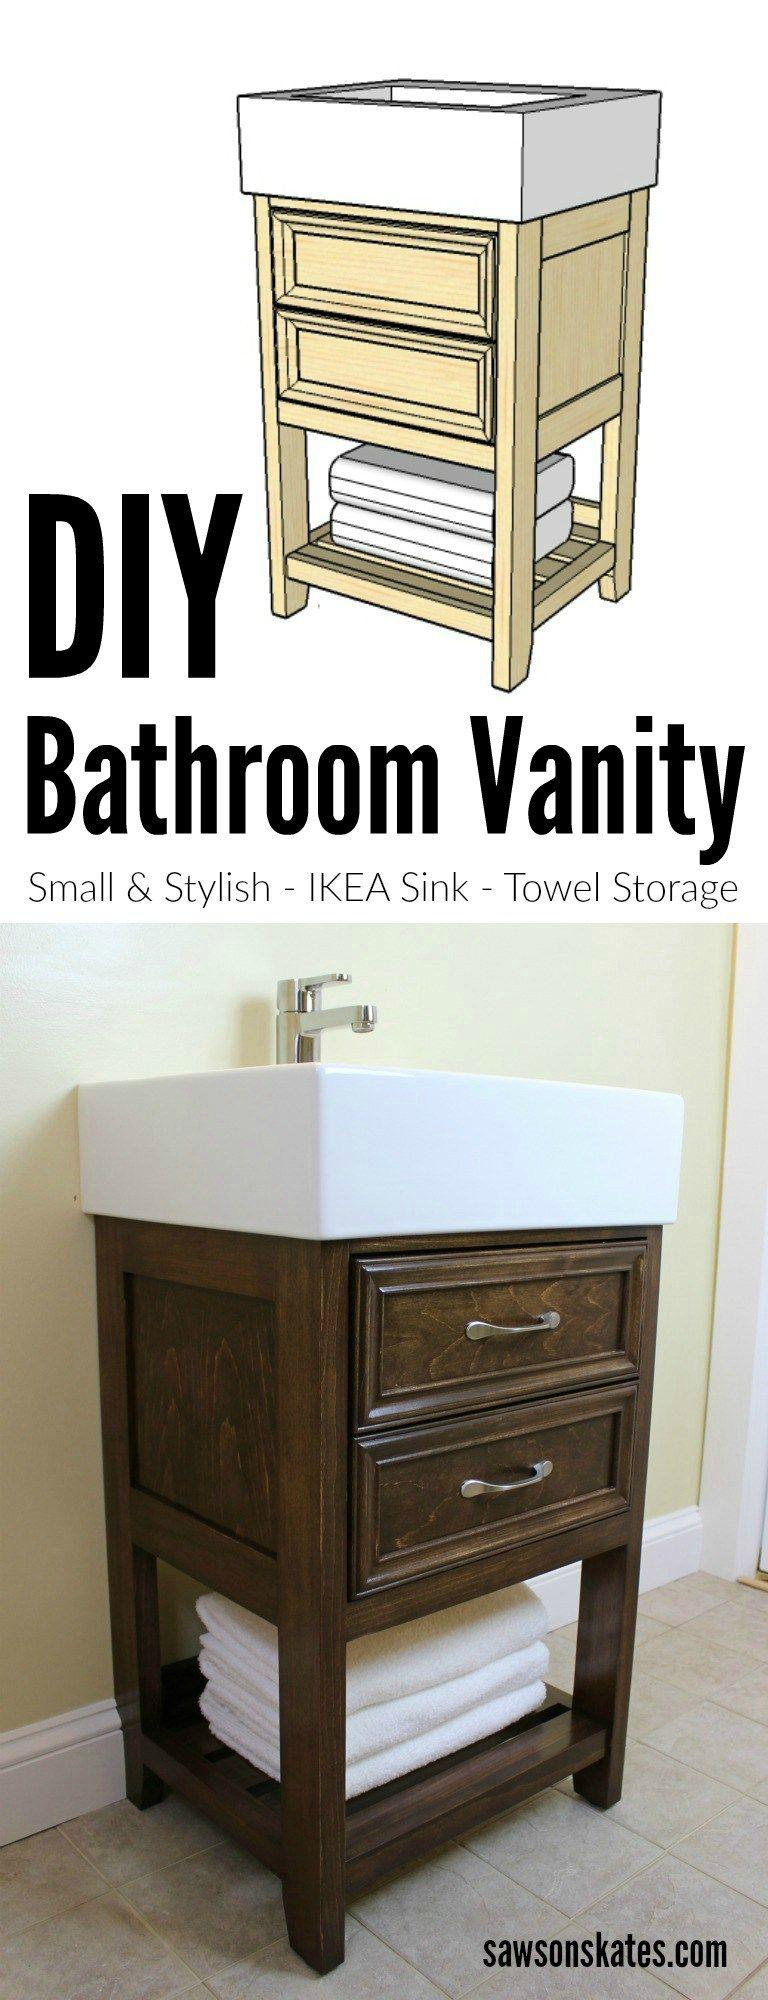 Small Size Big Style Diy Bathroom Vanity Small Bathroom Vanities Diy Bathroom Vanity Bathroom Sink Diy [ 2000 x 768 Pixel ]